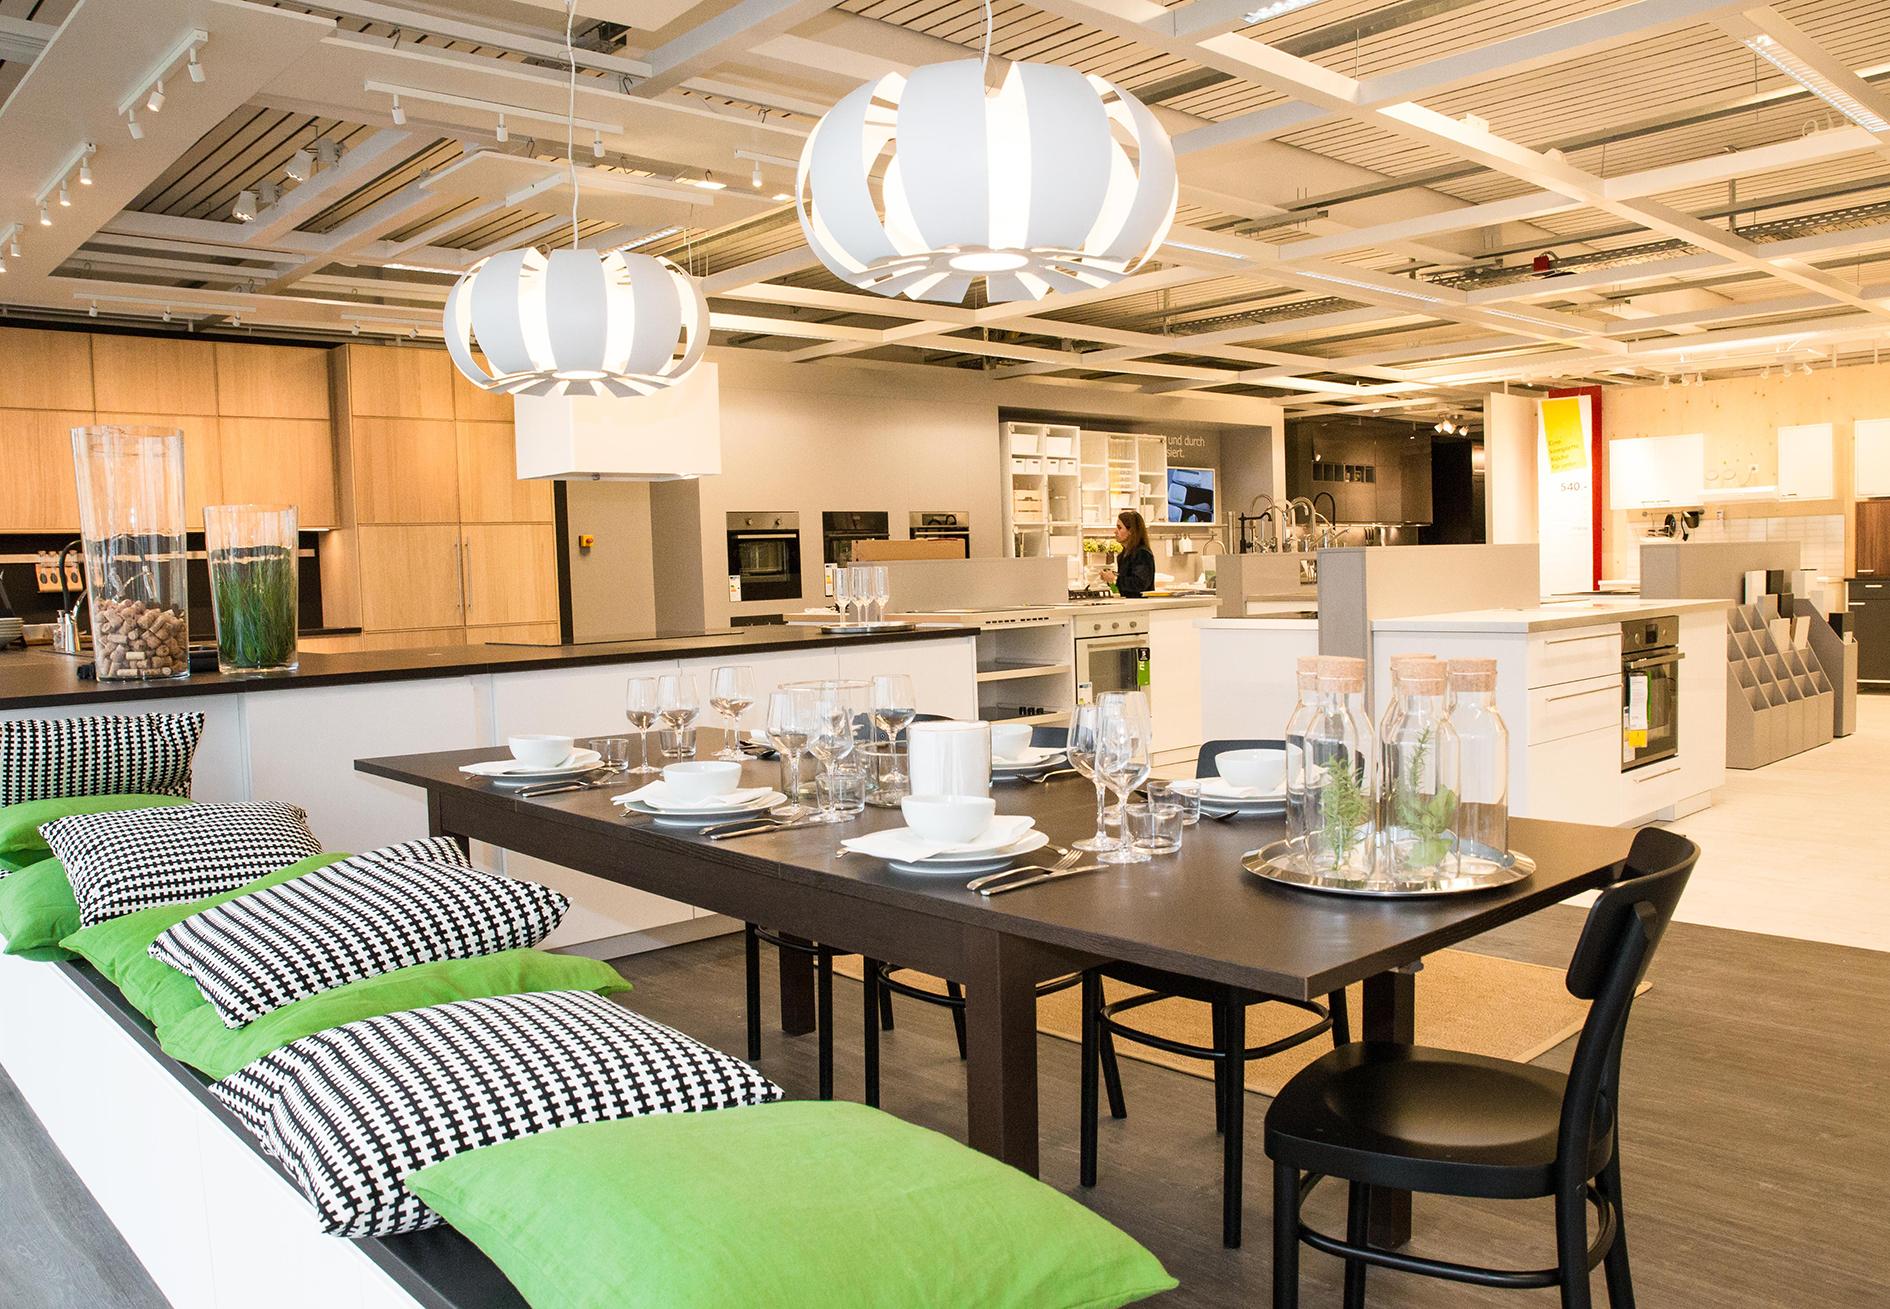 flucht in die fl che oder der krieg der m bler. Black Bedroom Furniture Sets. Home Design Ideas